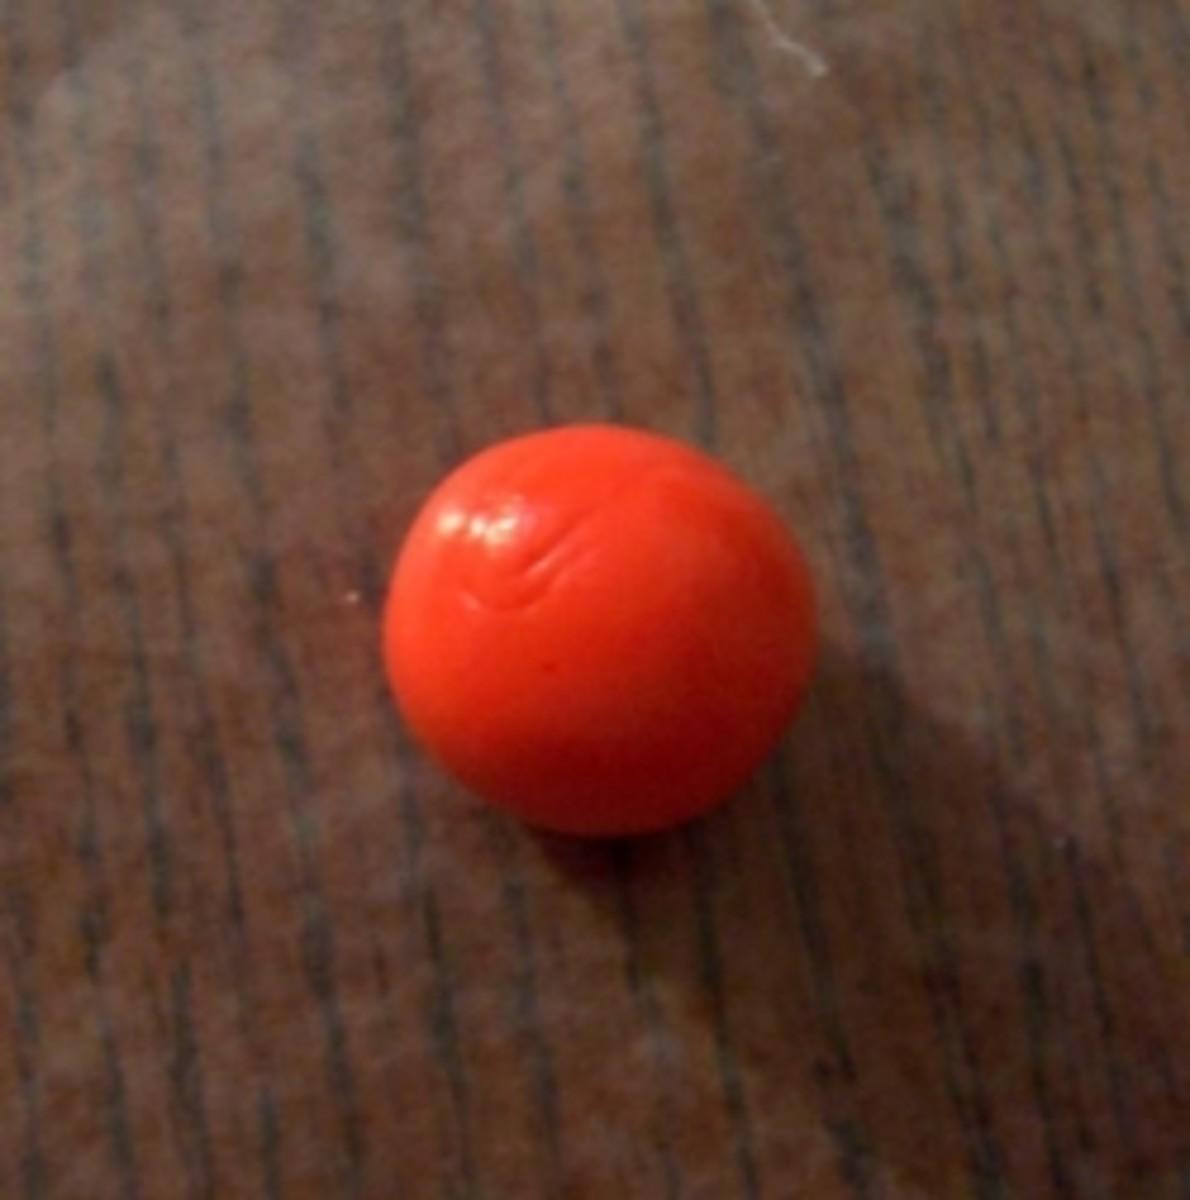 Sugar pumpkins, step 1. A ball of orange fondant.